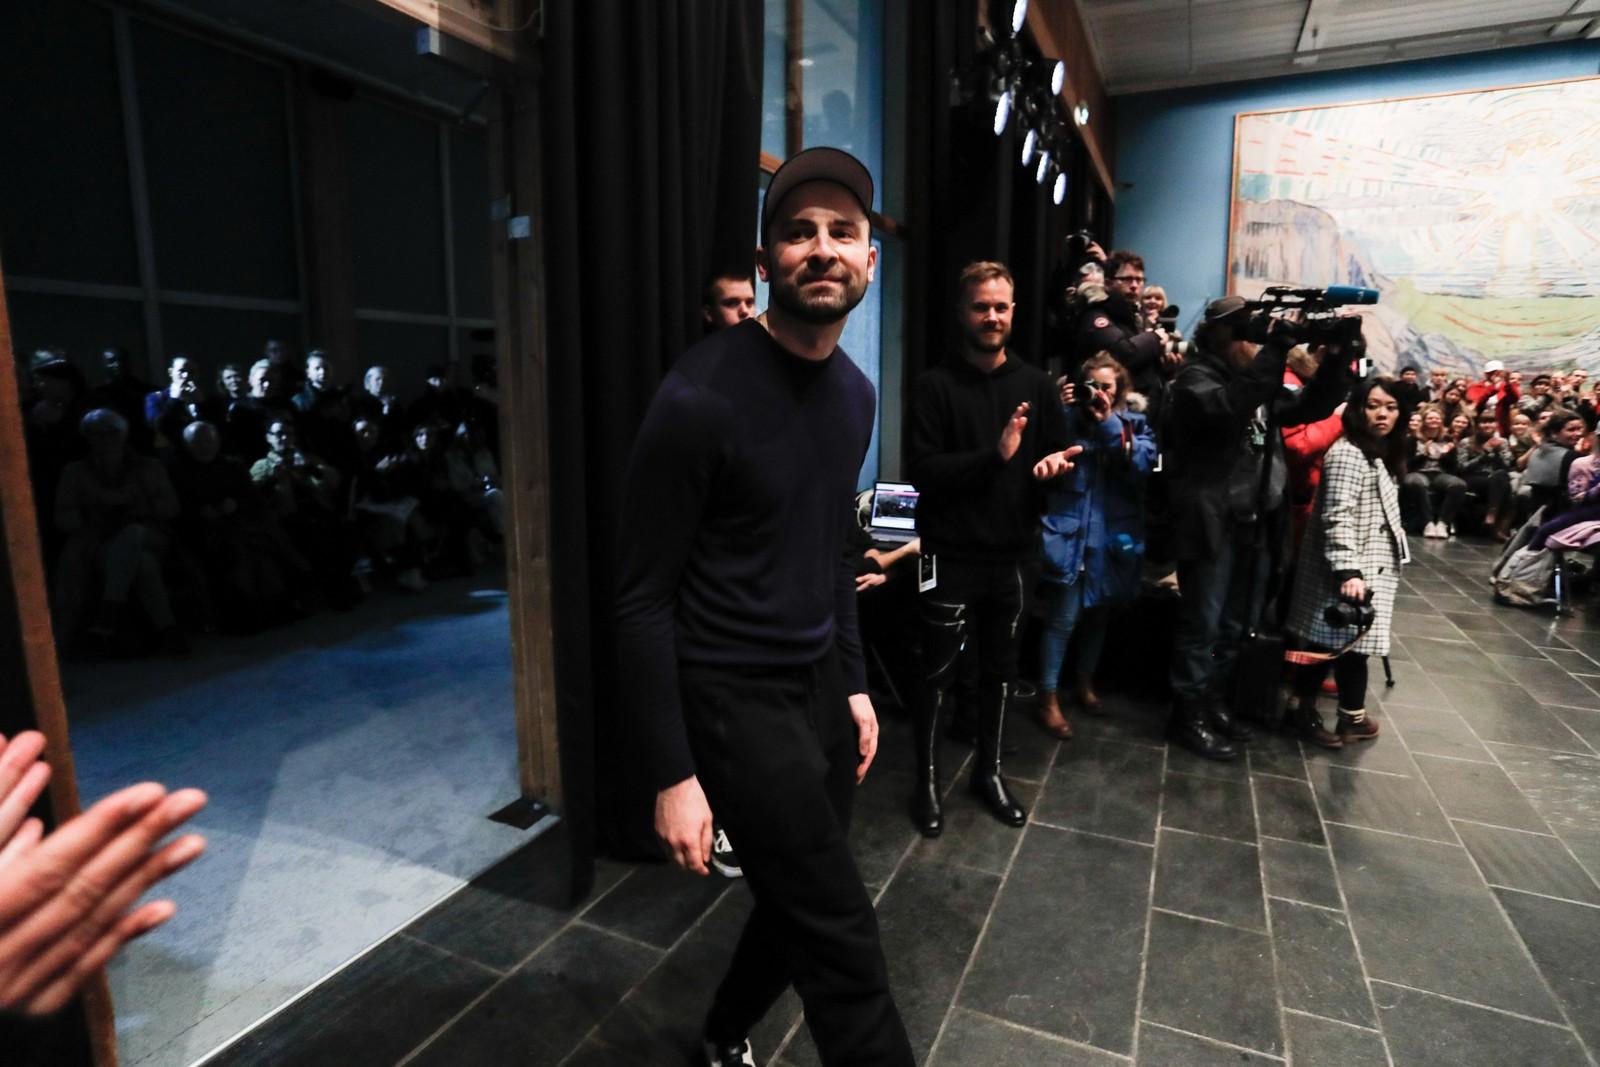 Designeren Admir Batlak på motevisningen på Munchmuseet i Oslo.